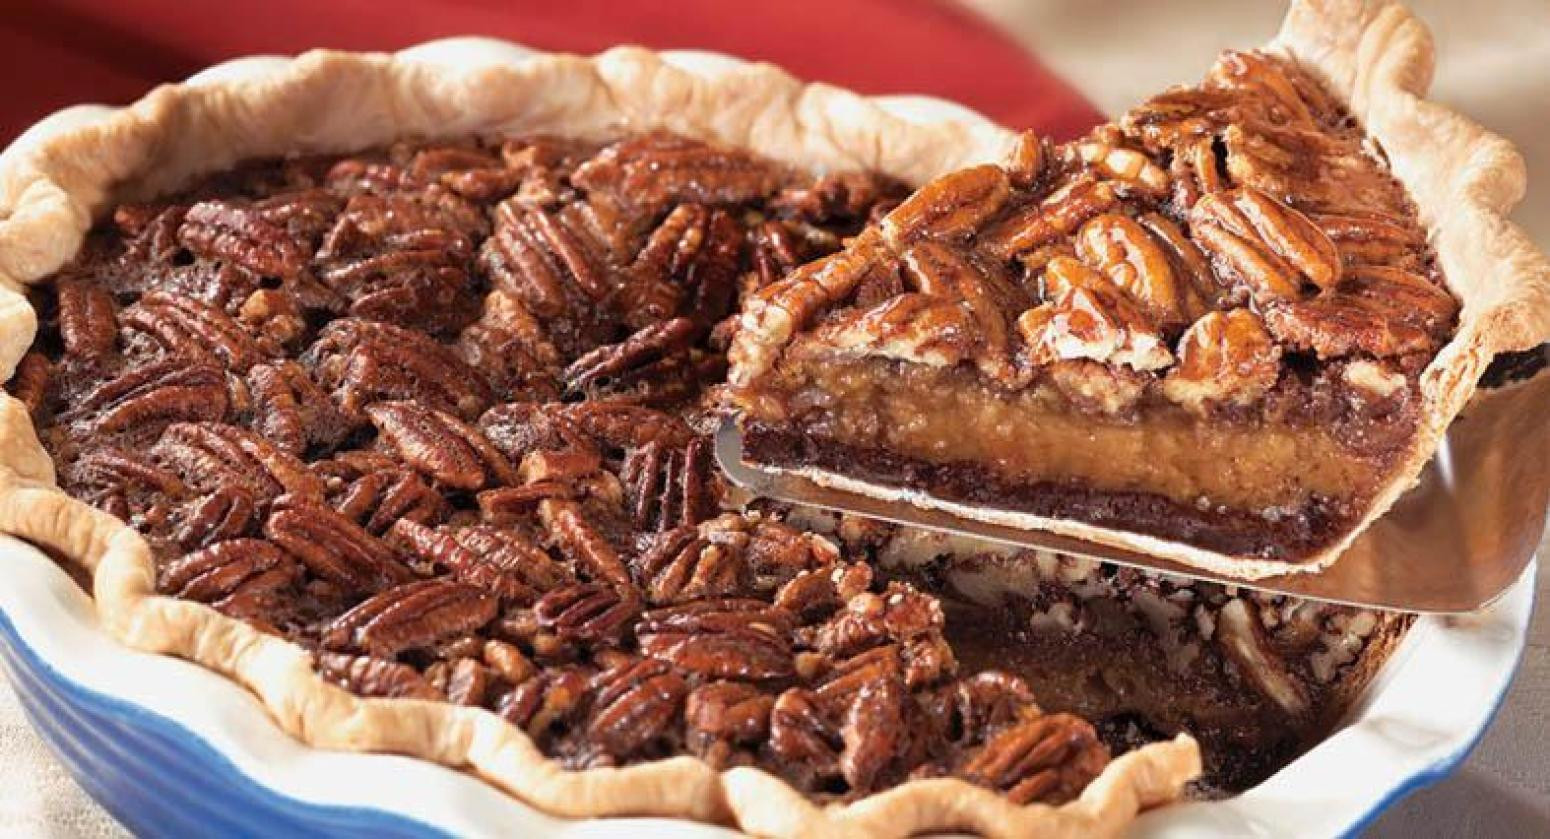 Chocolate Pecan Pie  Decadent Chocolate Pecan Pie Recipe